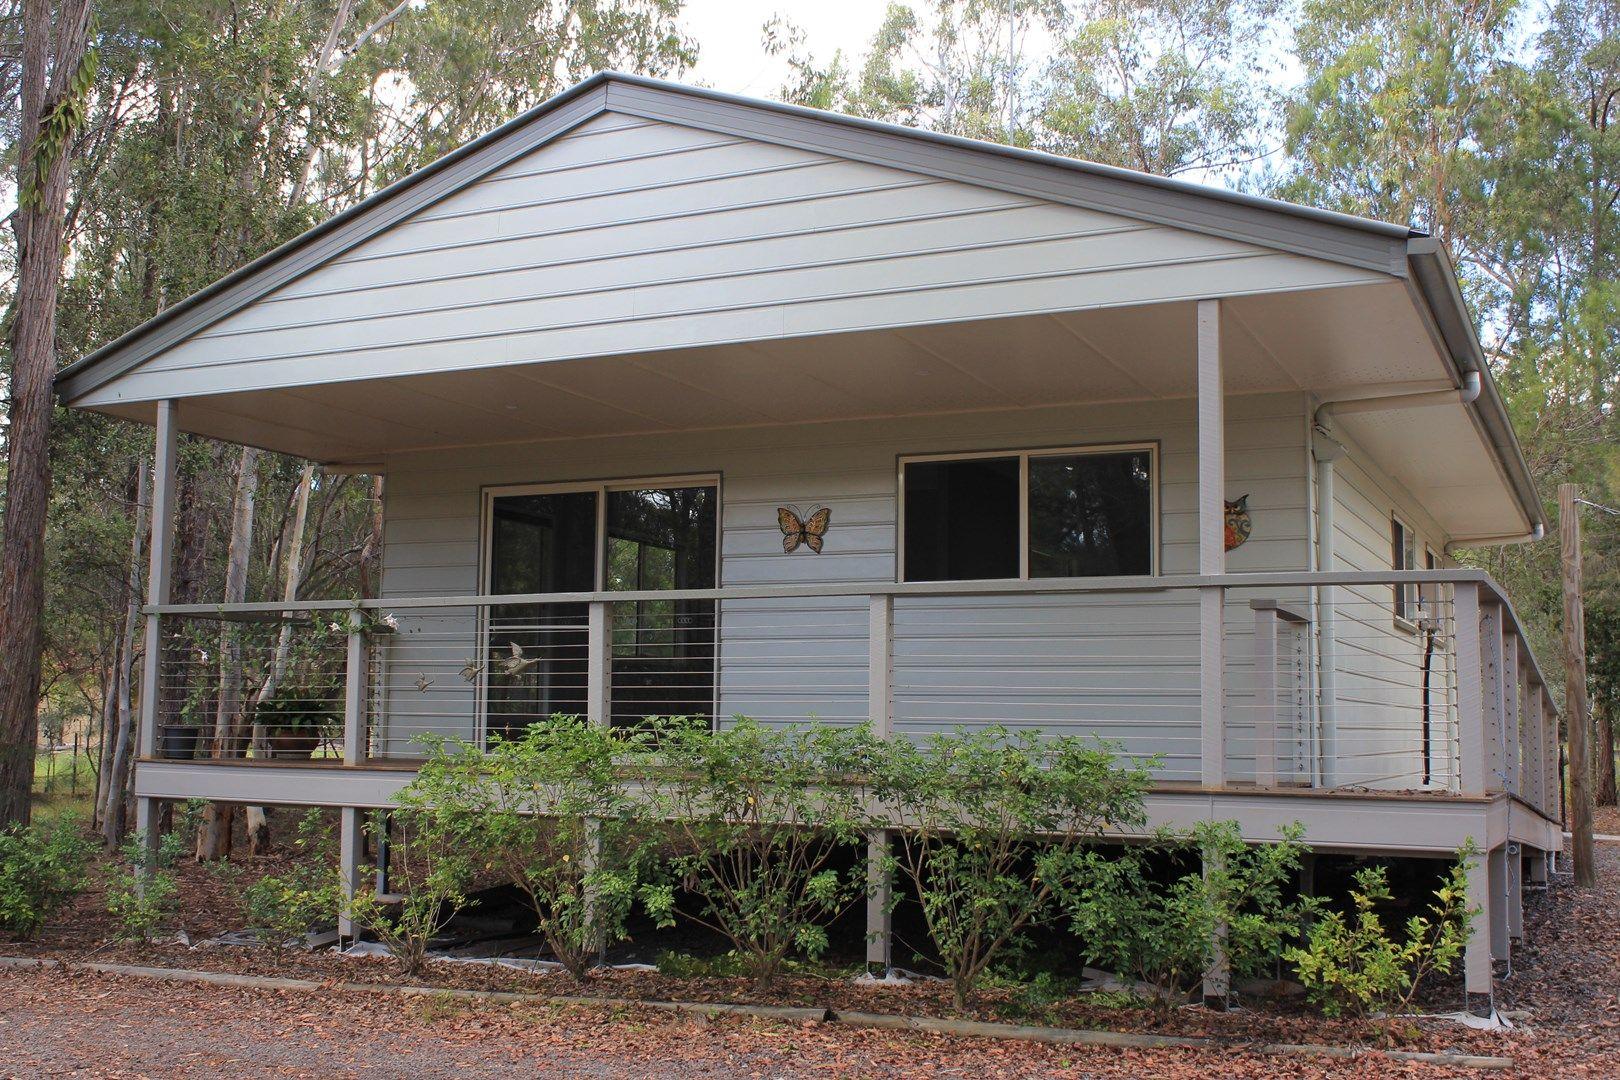 93 Silverwood Dr, Cooroibah QLD 4565, Image 0